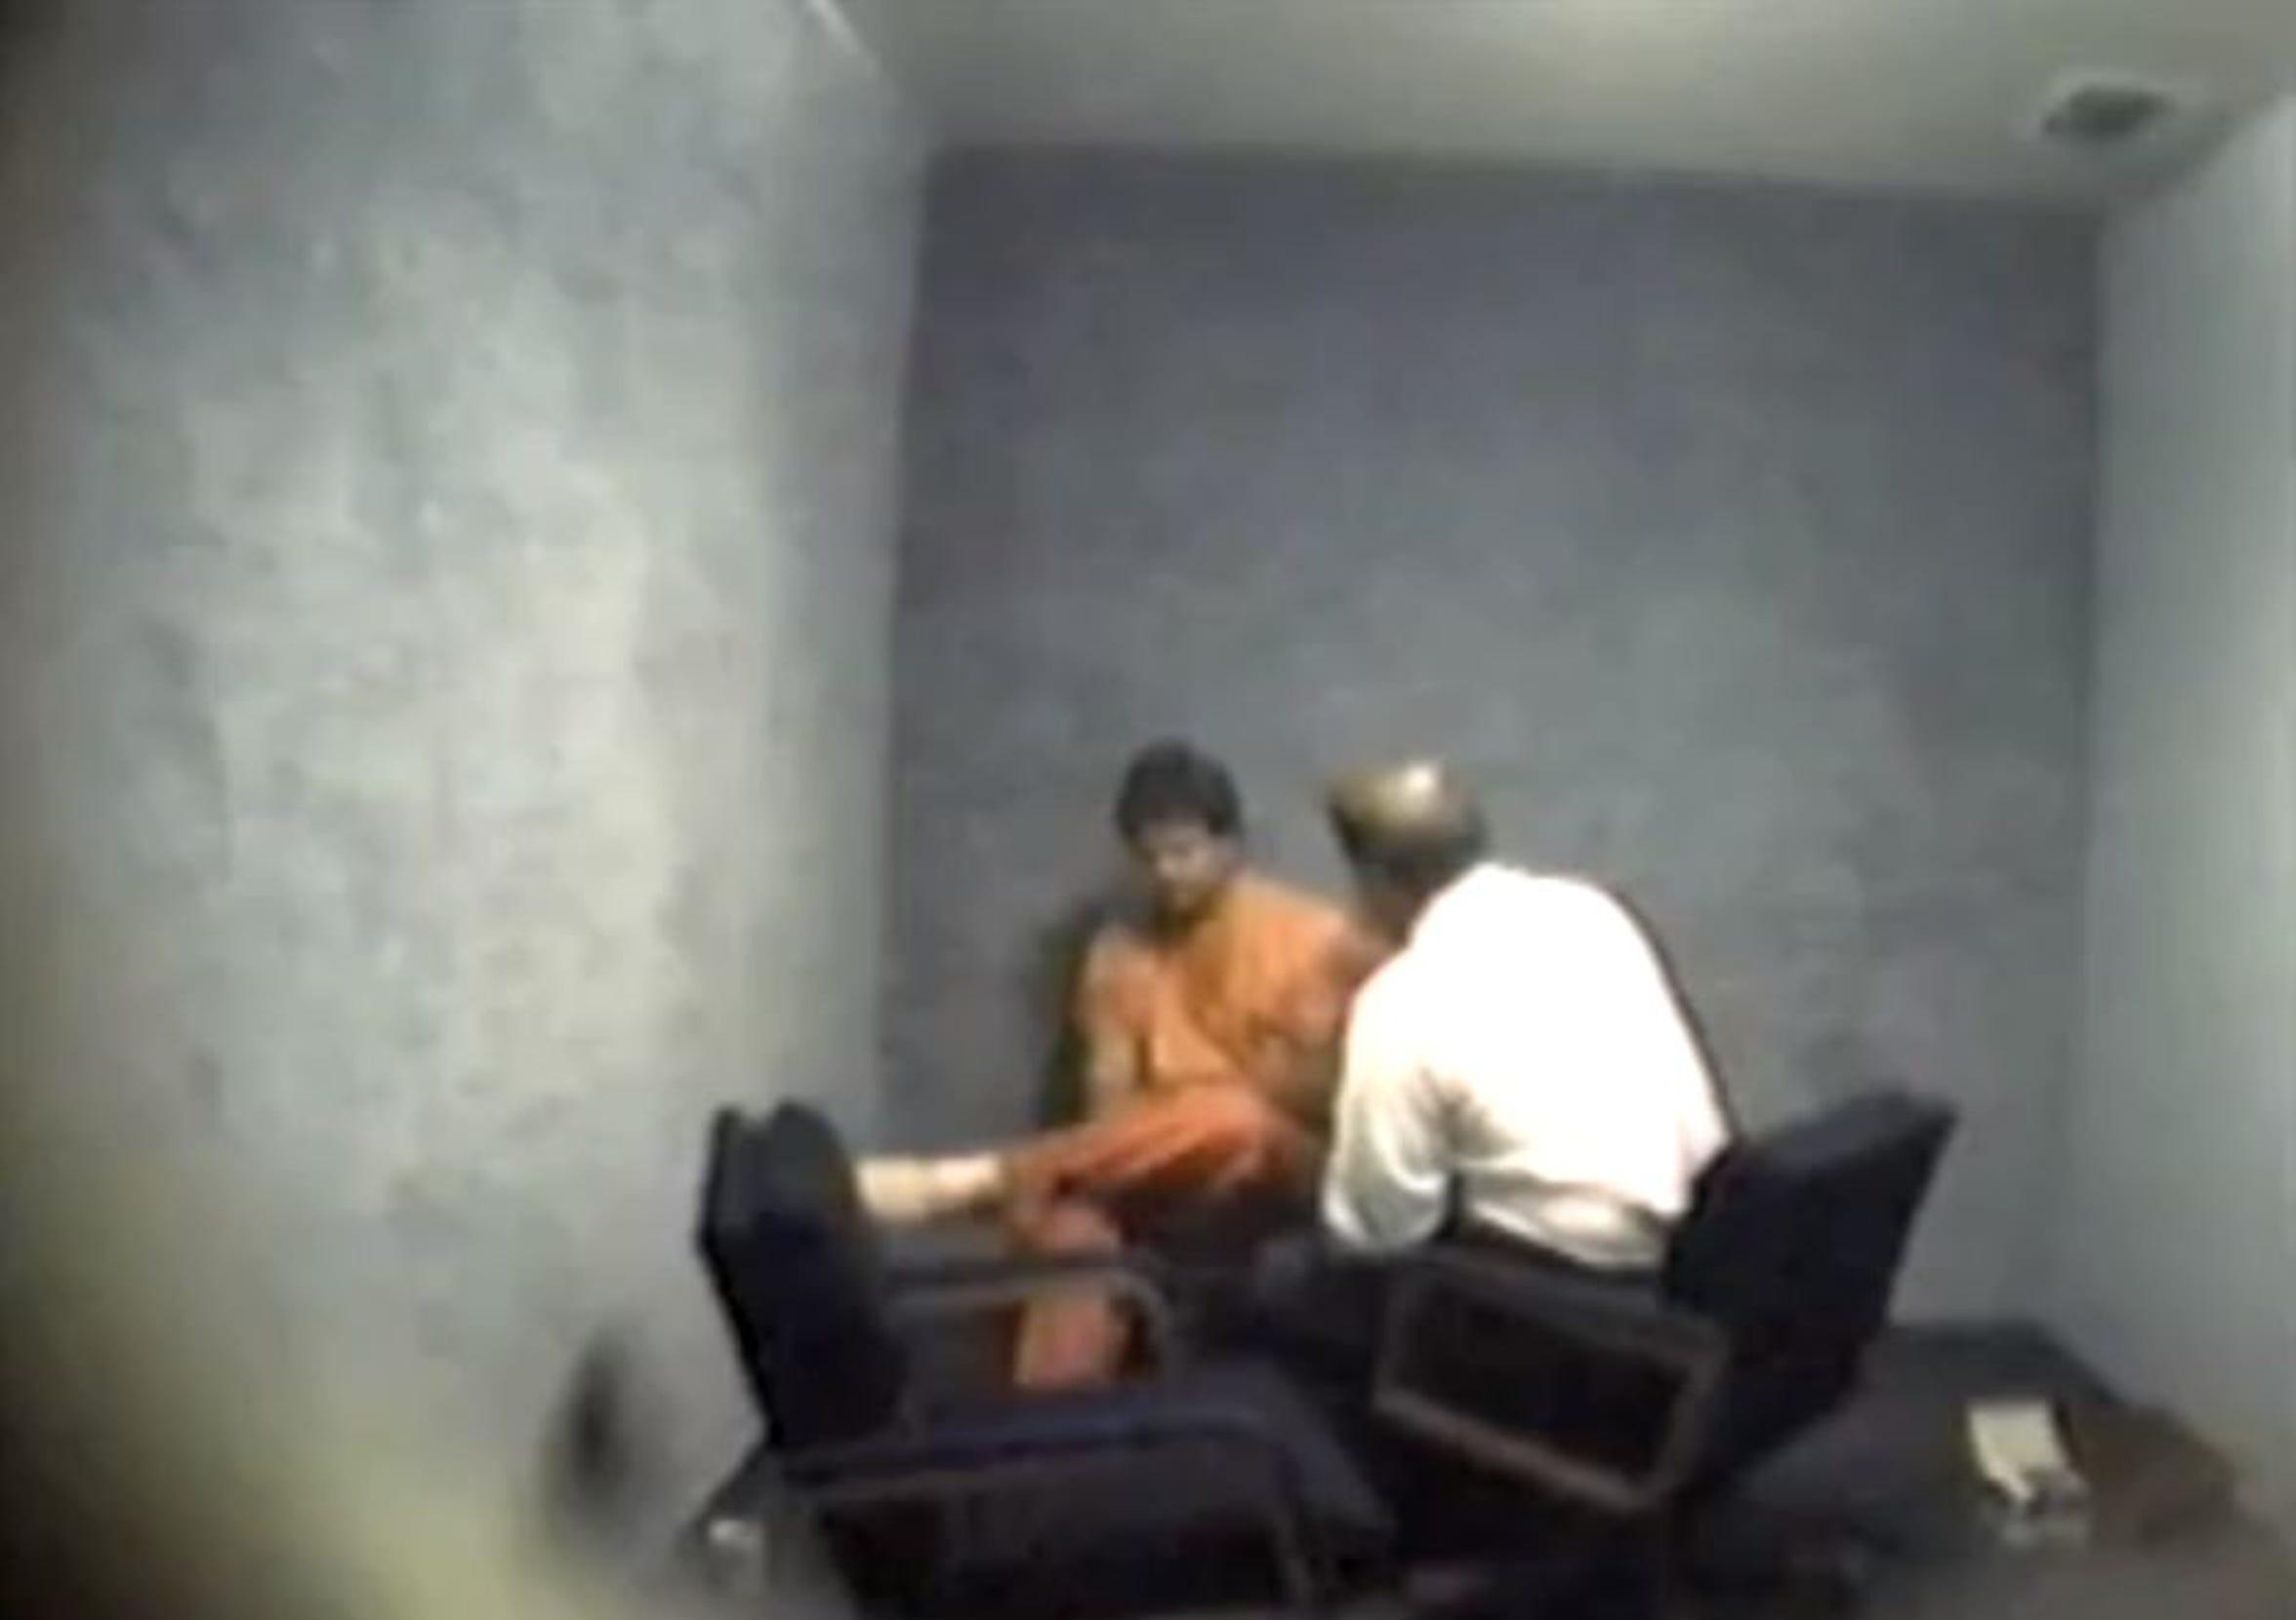 Jeff Abramowski is interrogated following his arrest on suspicion of murder in 2002.